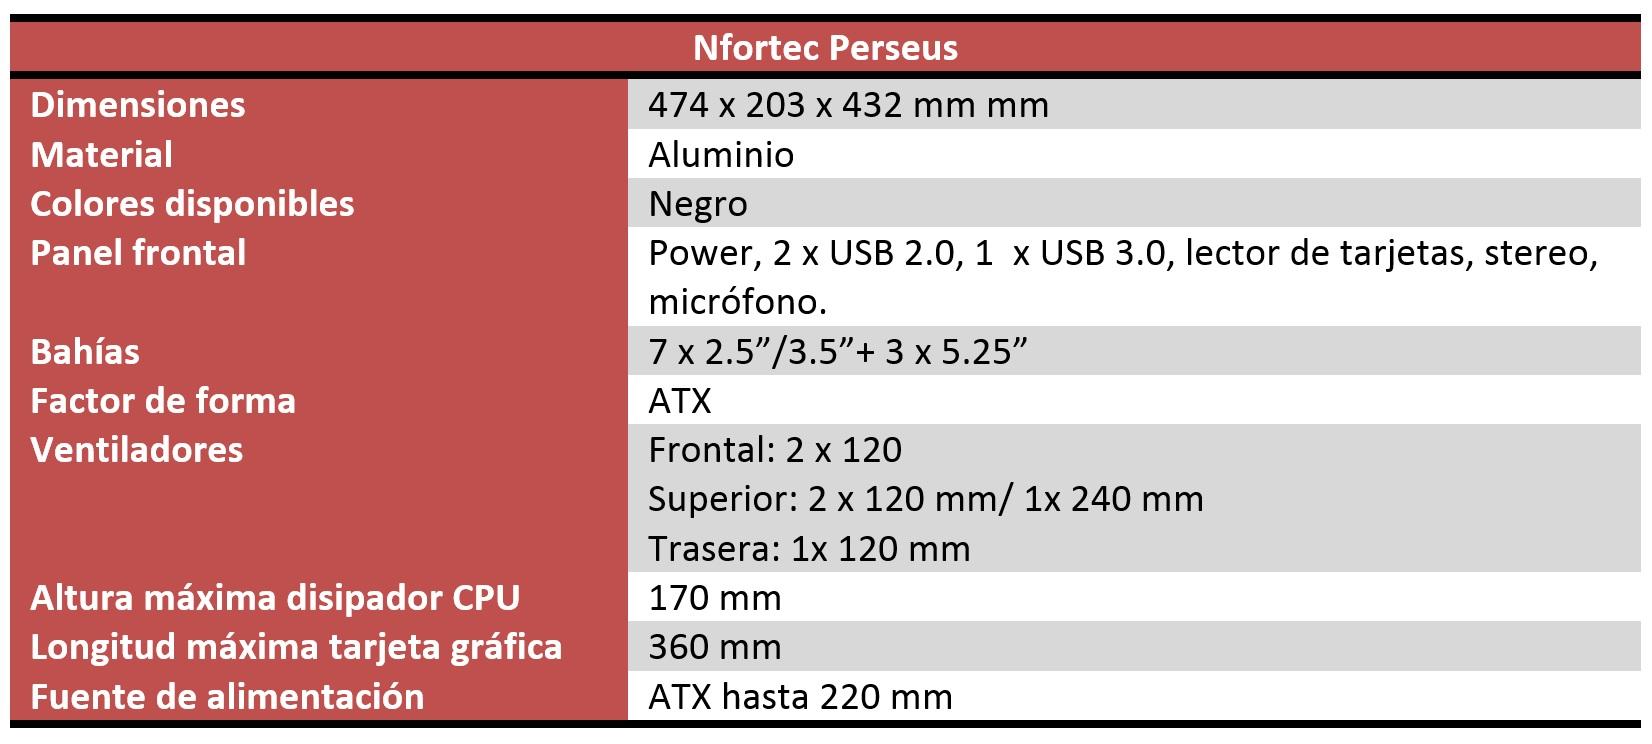 Nfortec Perseus caracteristicas